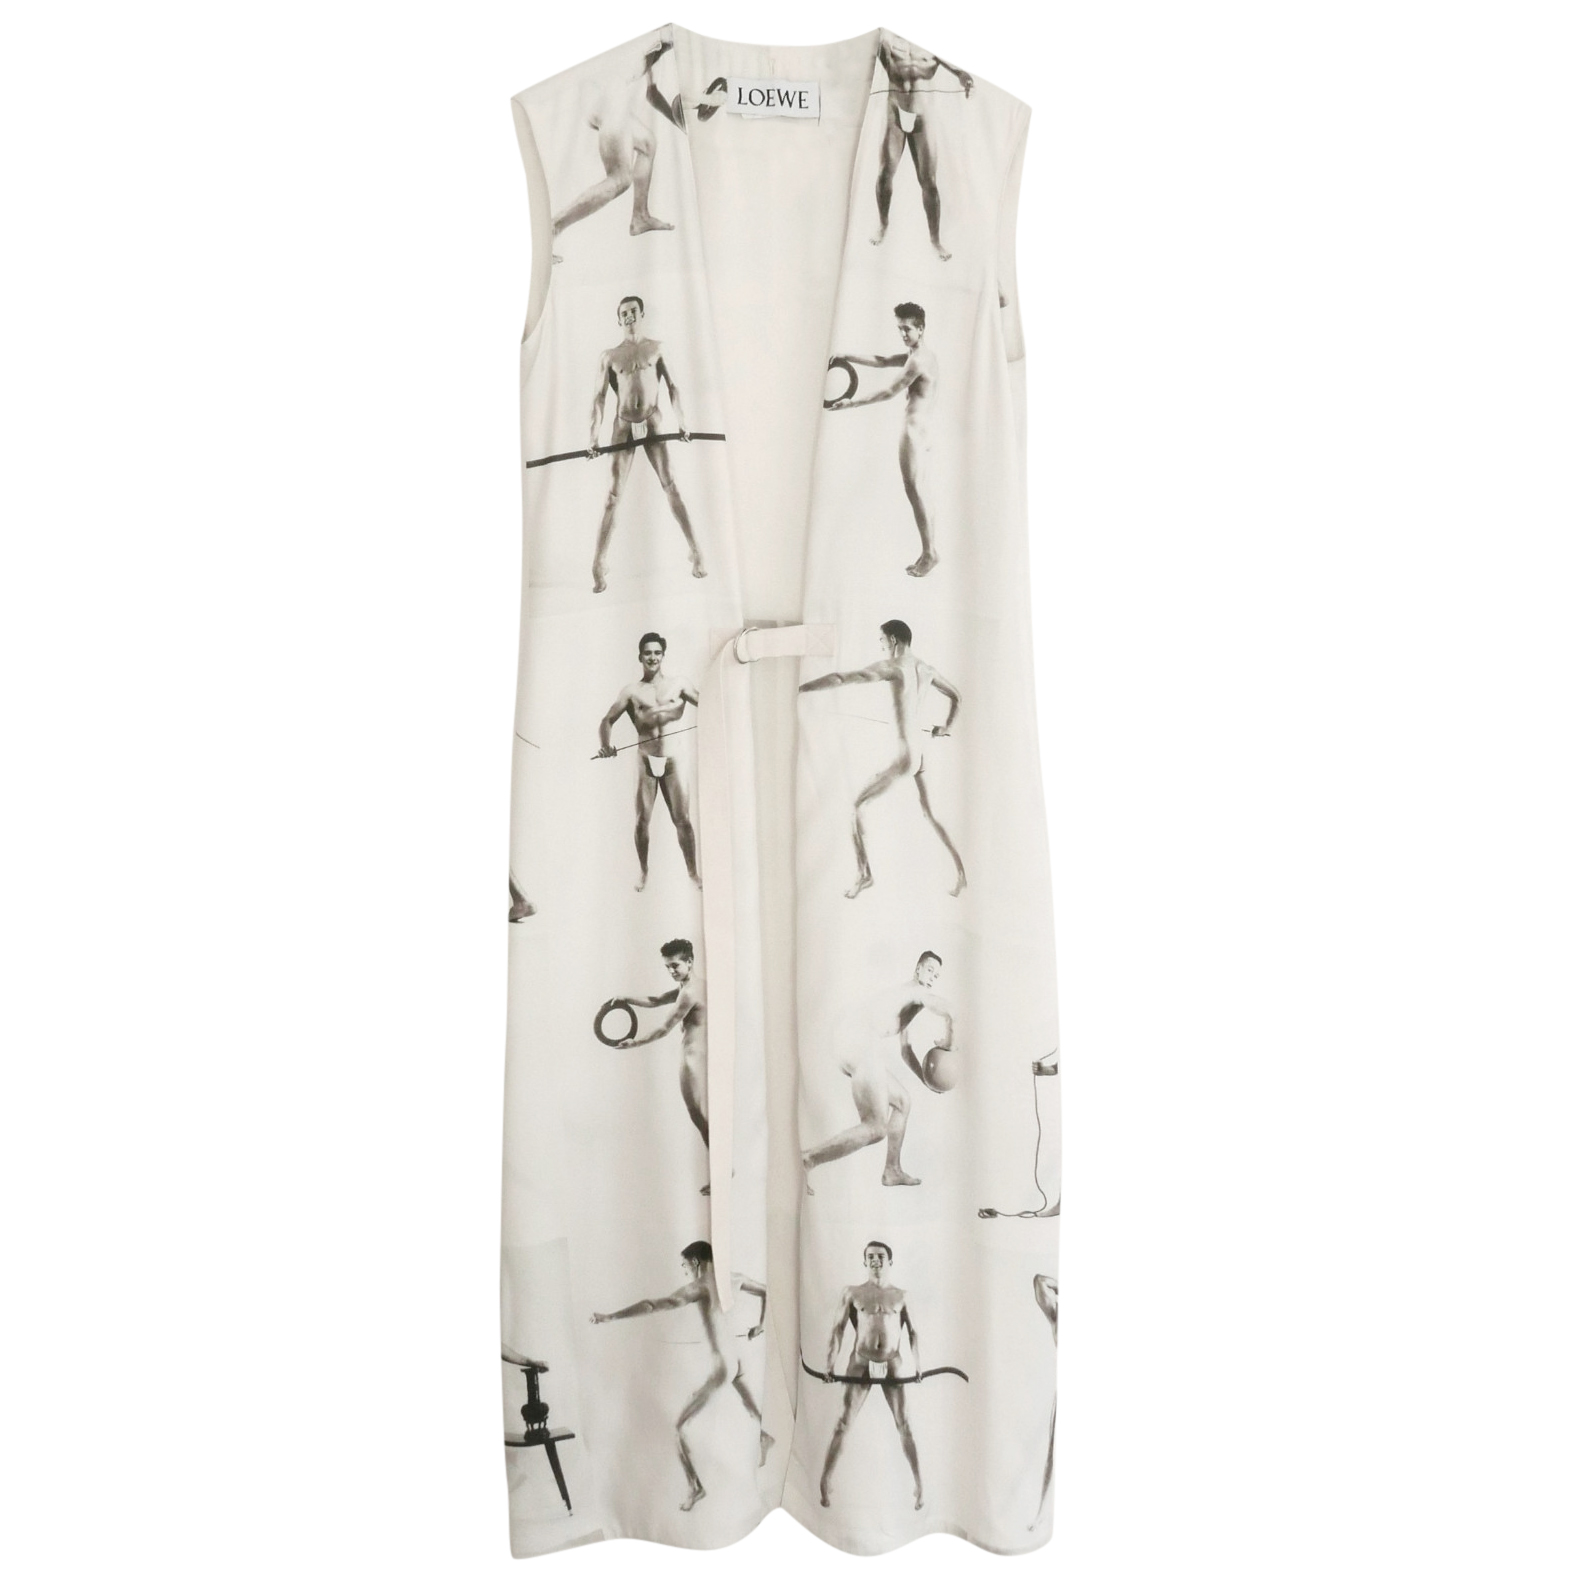 Loewe SS18 sleeveless longline jacket